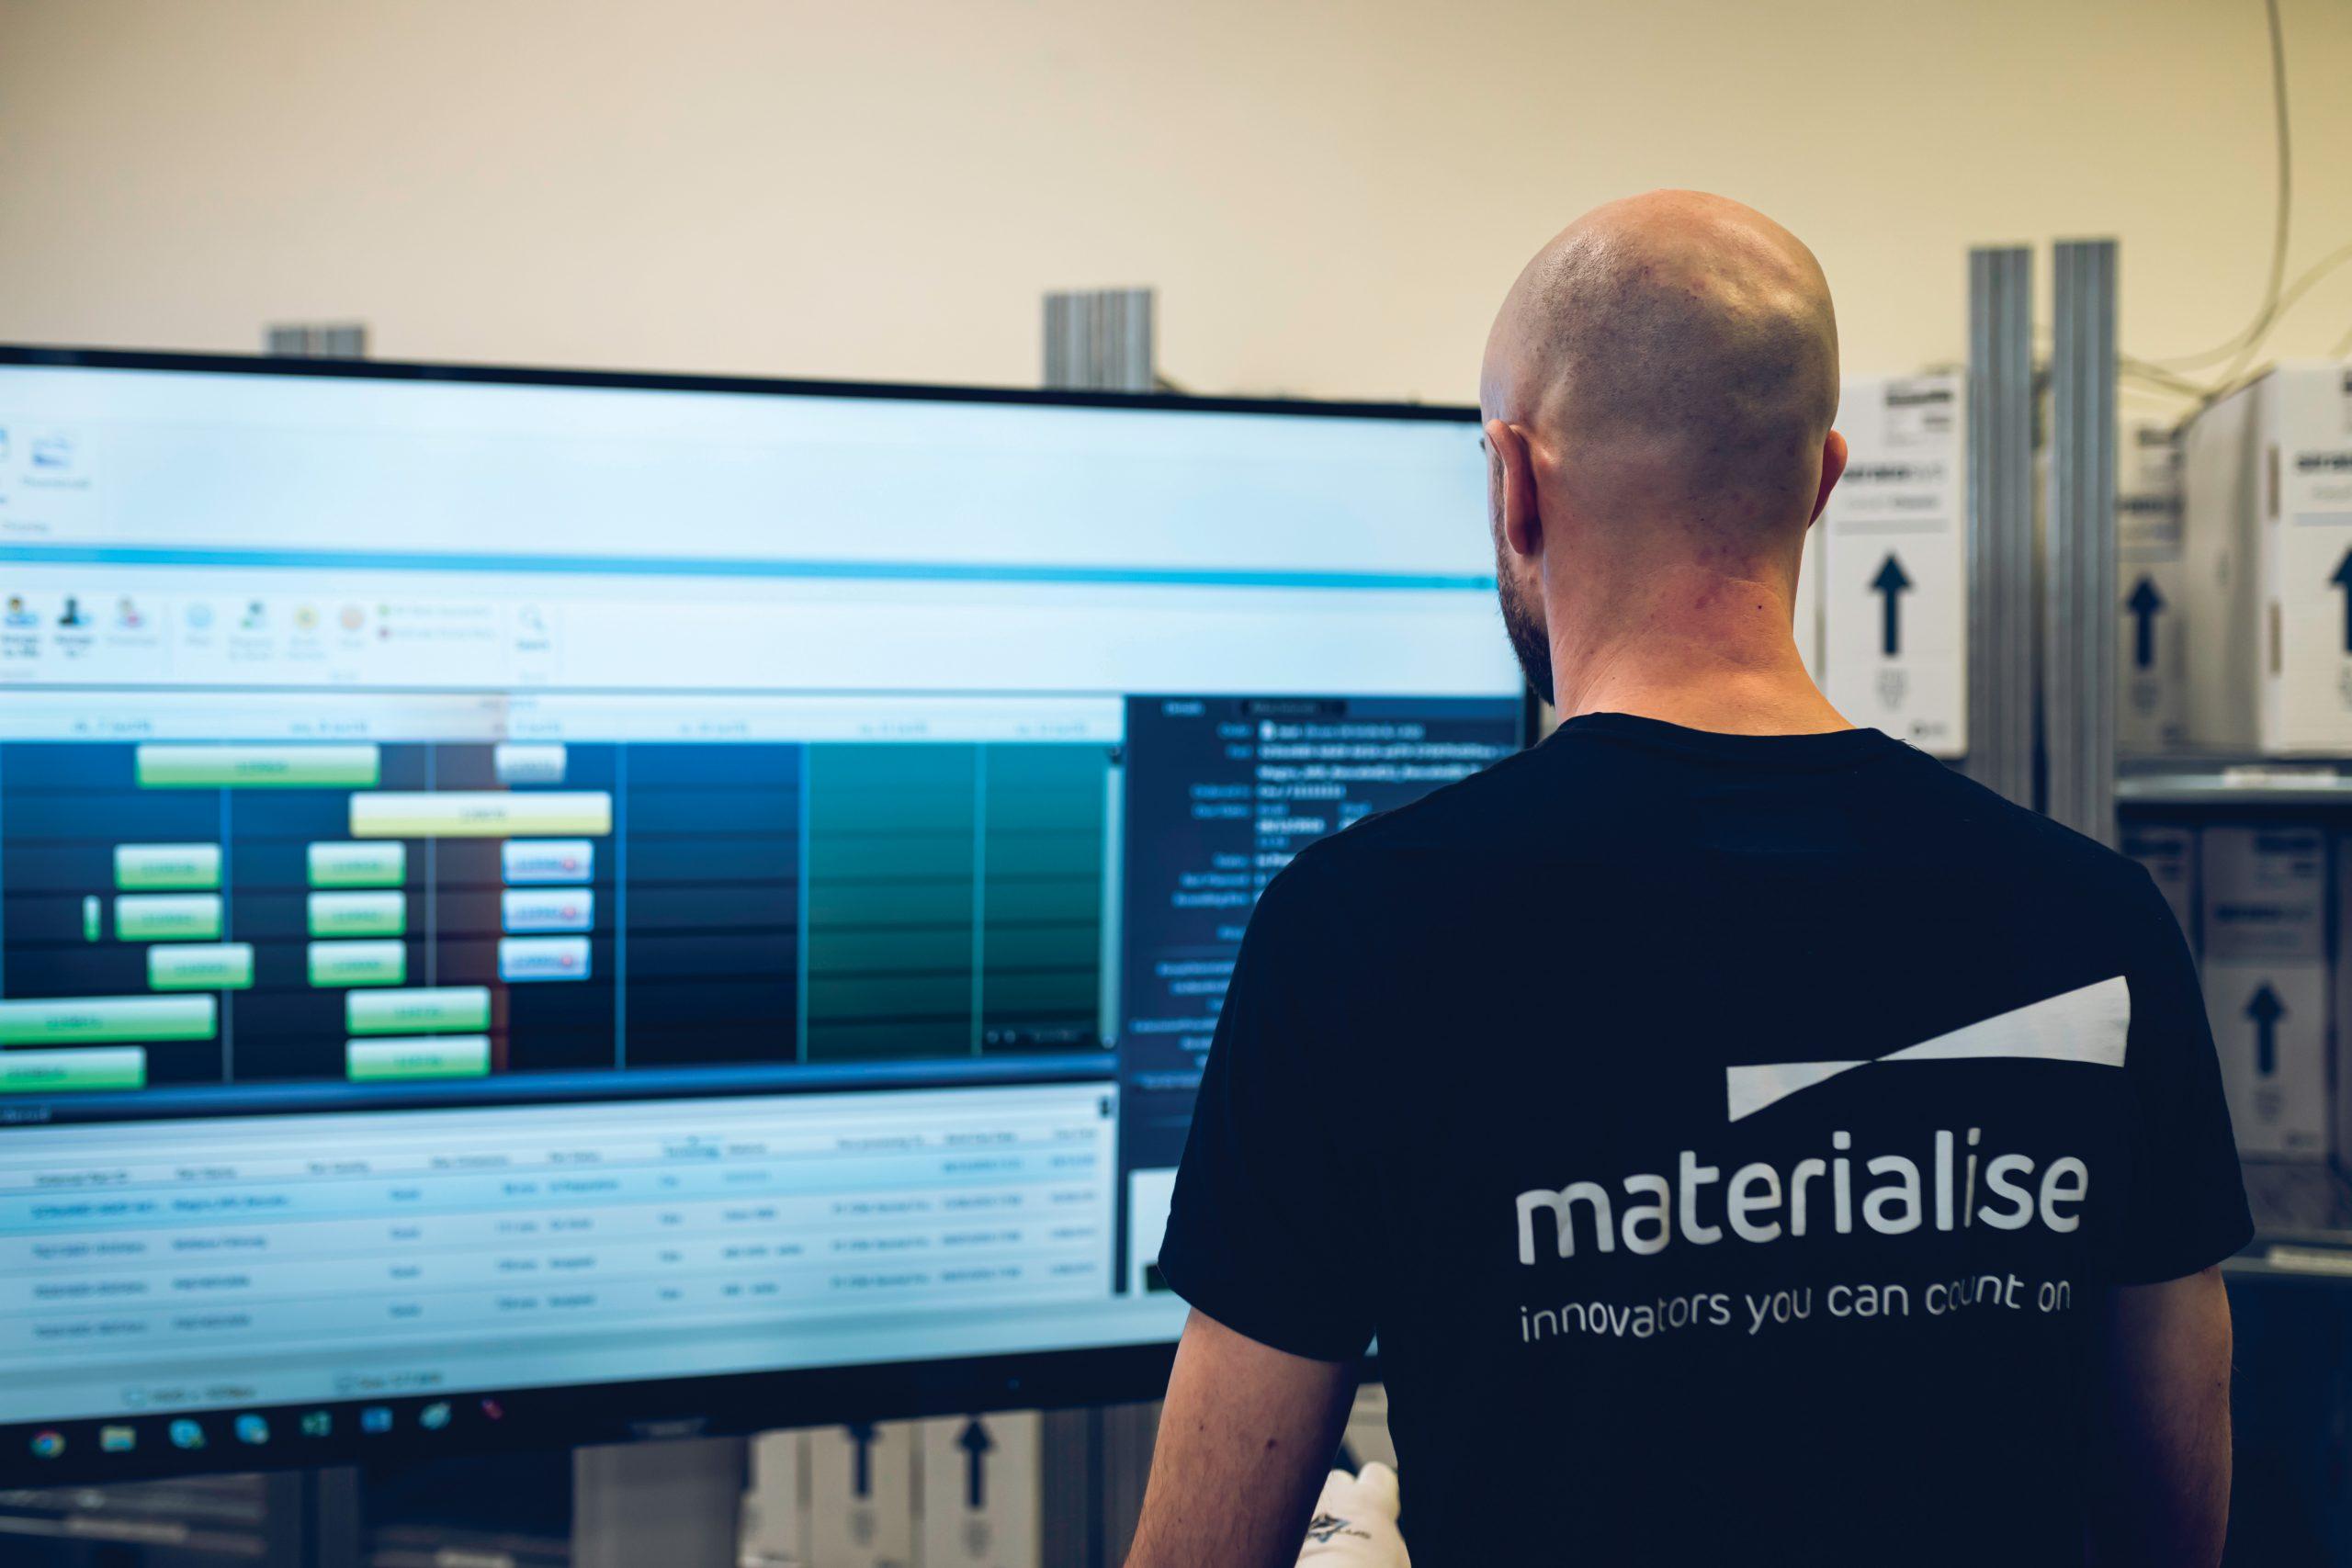 Bild: Materialise GmbH